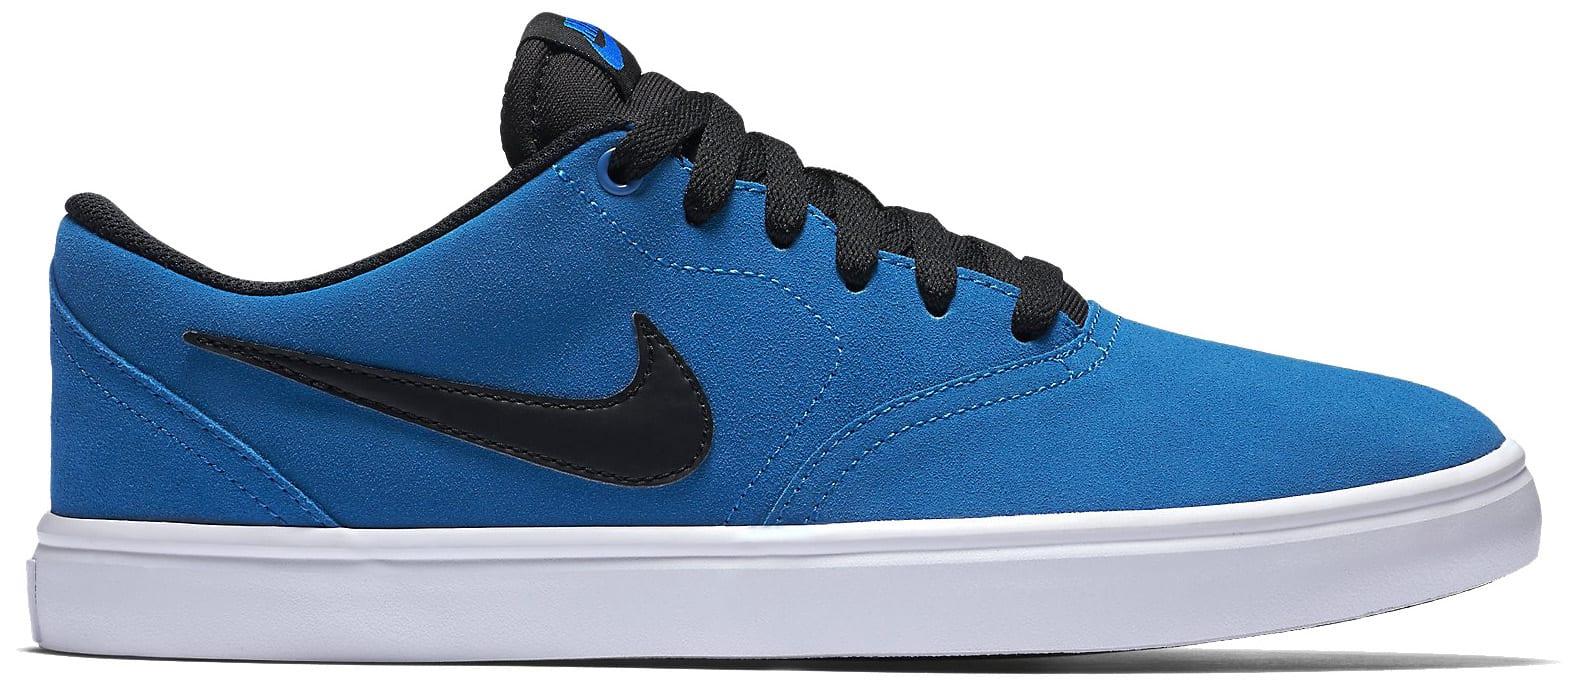 325debbcc59cc1 Nike SB Check Solar Skate Shoes - thumbnail 1